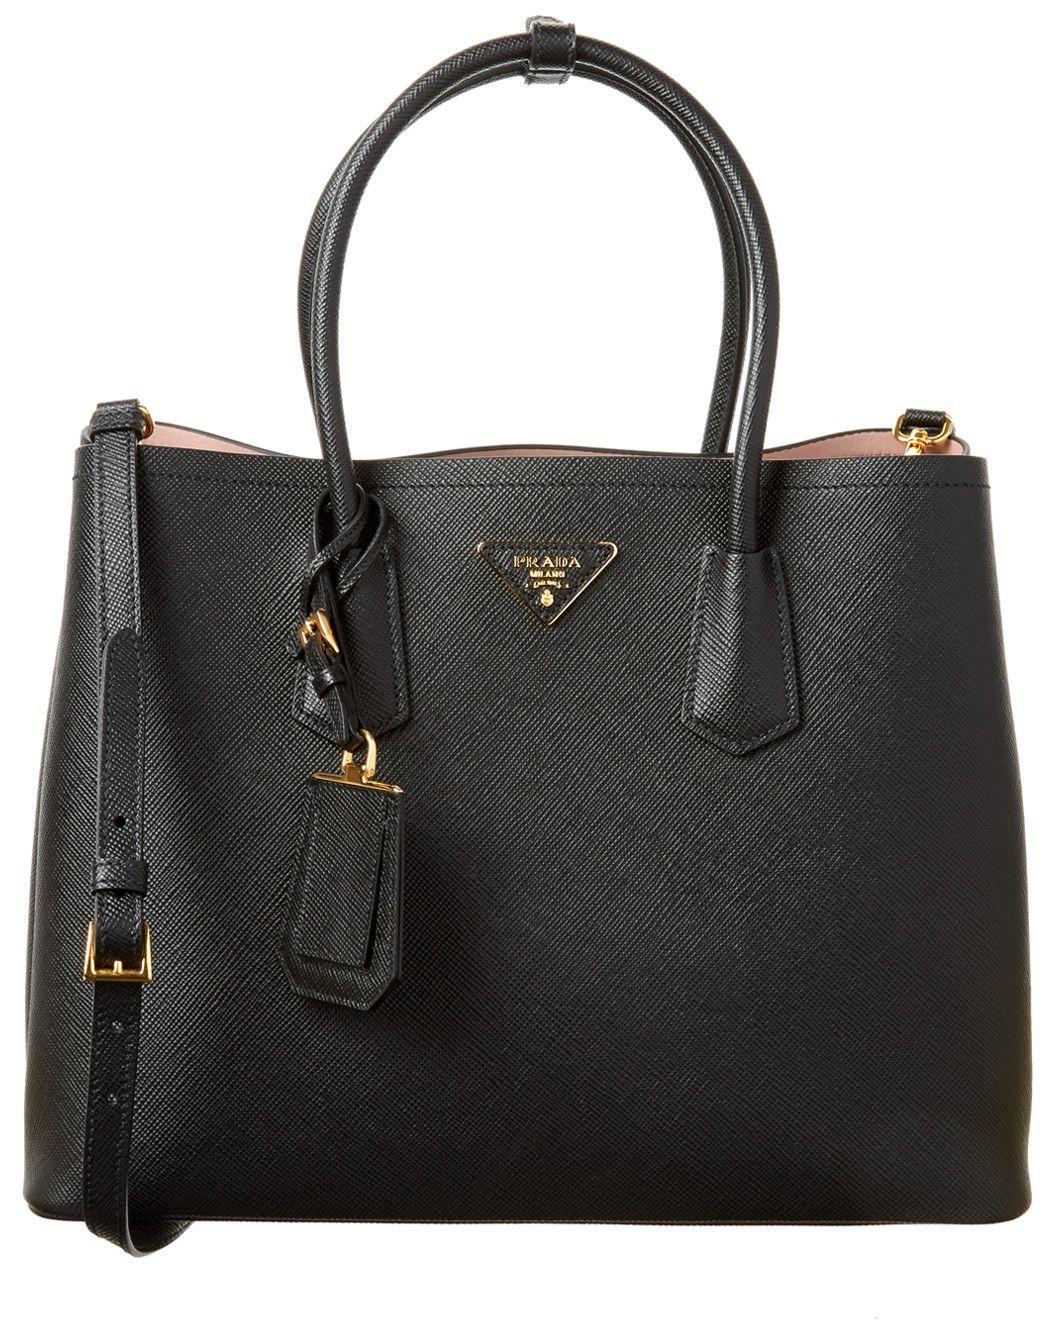 6c55ff3ba Prada Saffiano Cuir Leather Double Handle Tote | Money Bags in 2019 ...